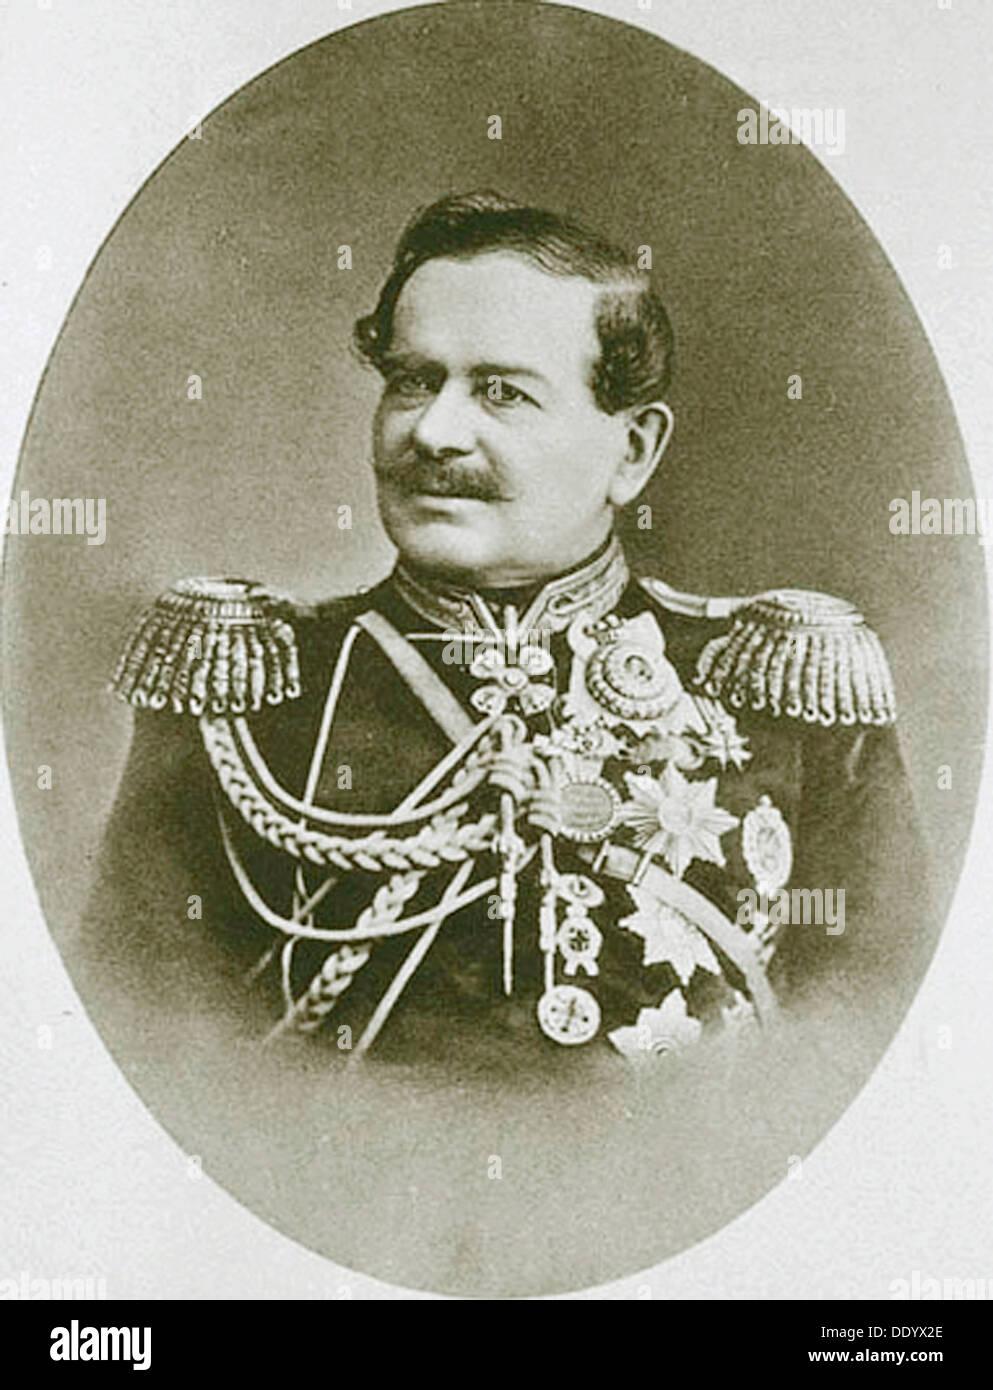 Prince Vladimir Dolgorukov, Mayor of Moscow, 1873. - Stock Image